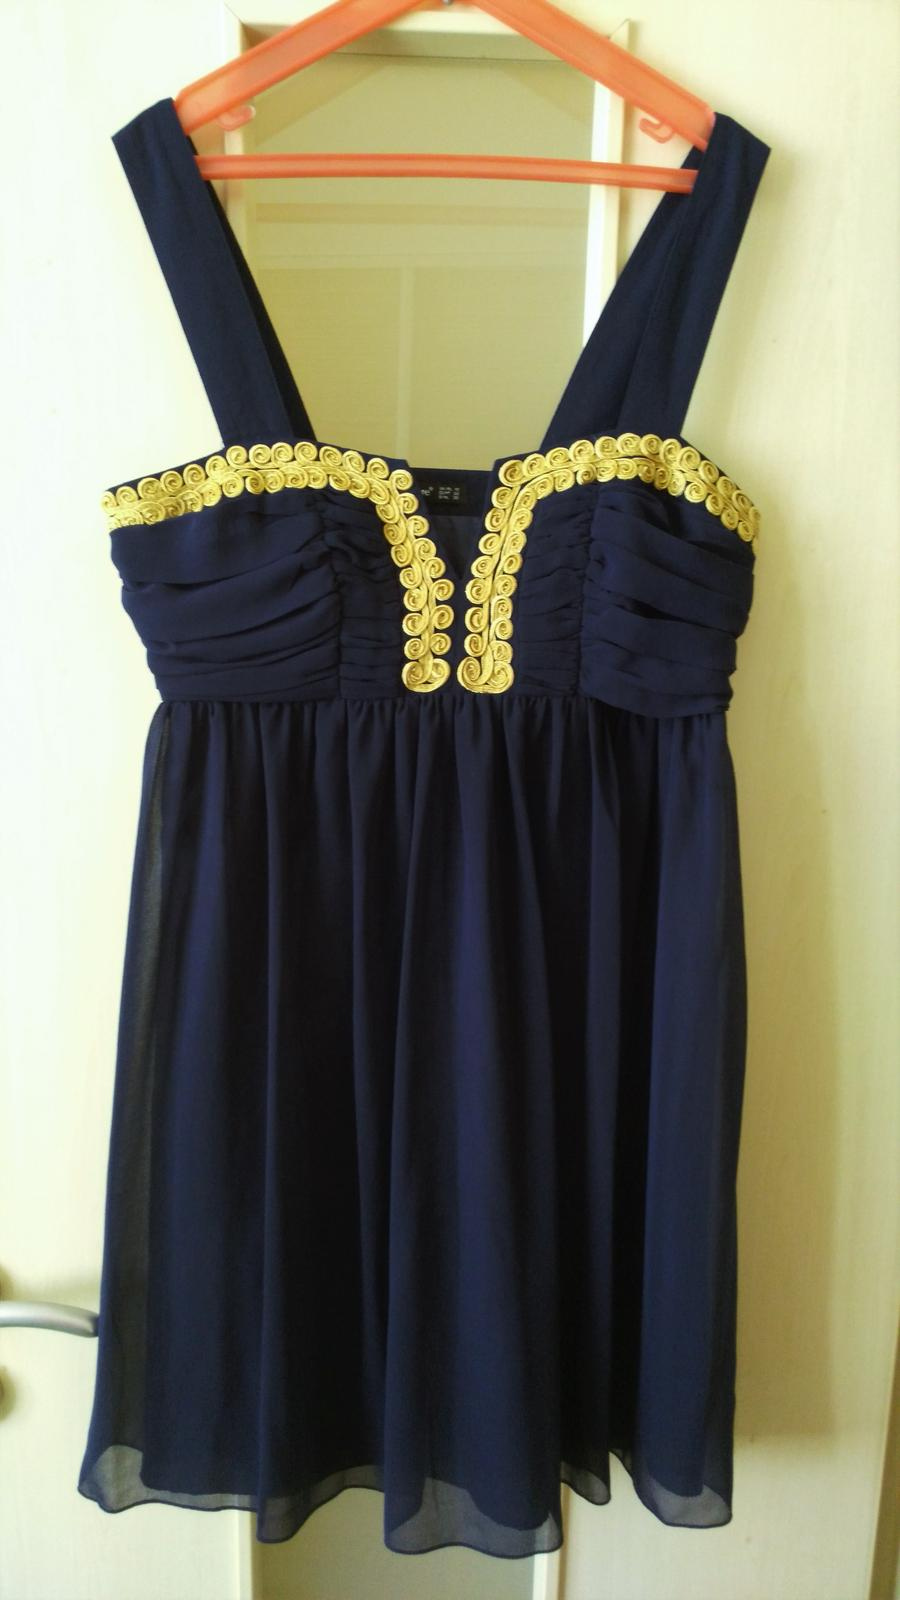 Tmavomodré elegantné šaty č.38 (M) - Obrázok č. 1